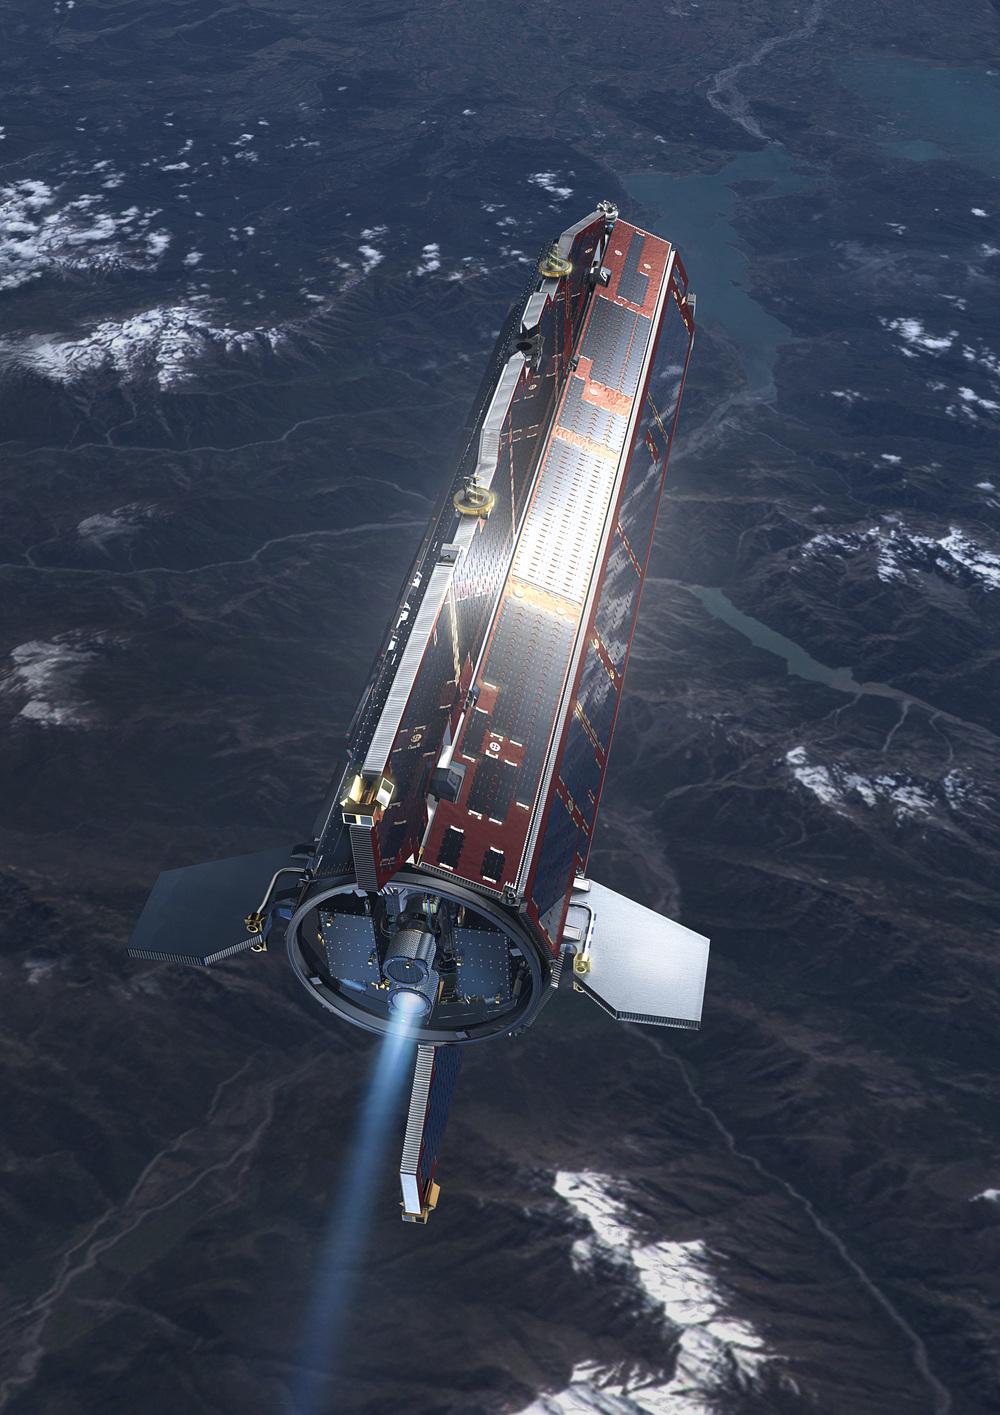 GOCE in orbit  CopyrightESA/AOES Medialab